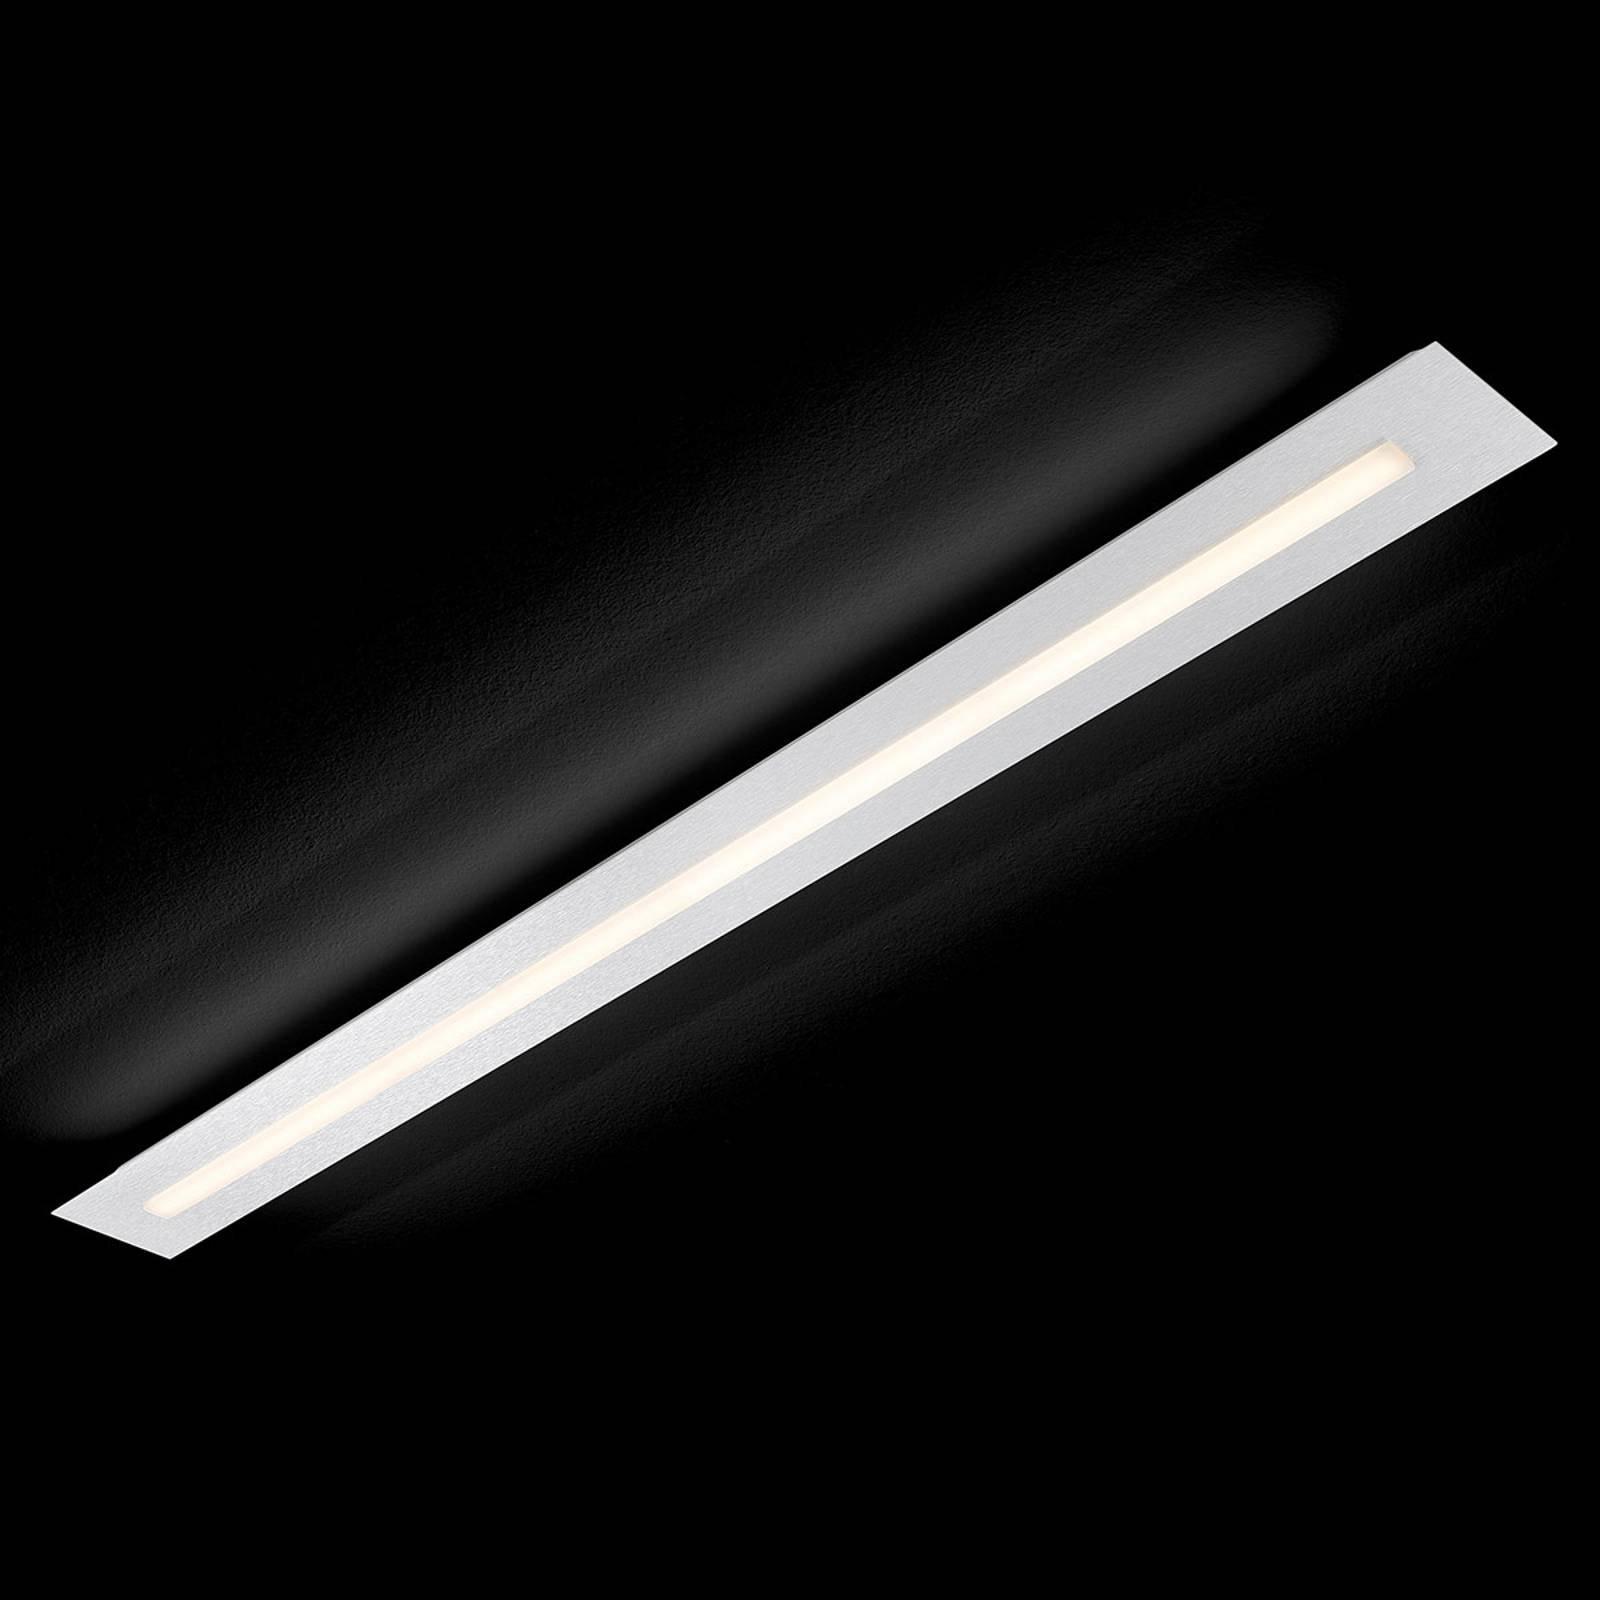 GROSSMANN Fis LED-taklampe, 104 cm.